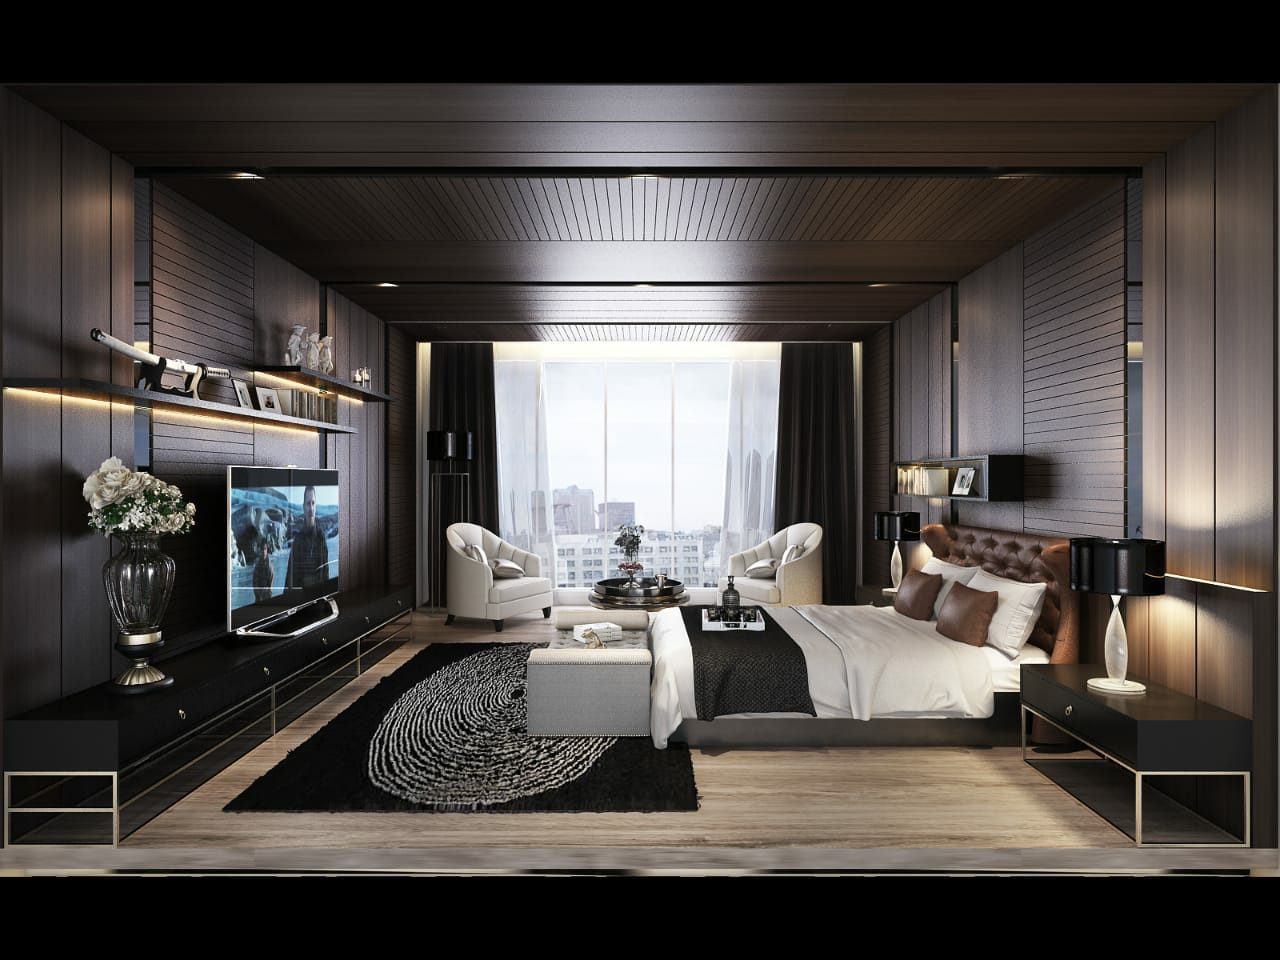 3D Furniture Imaging